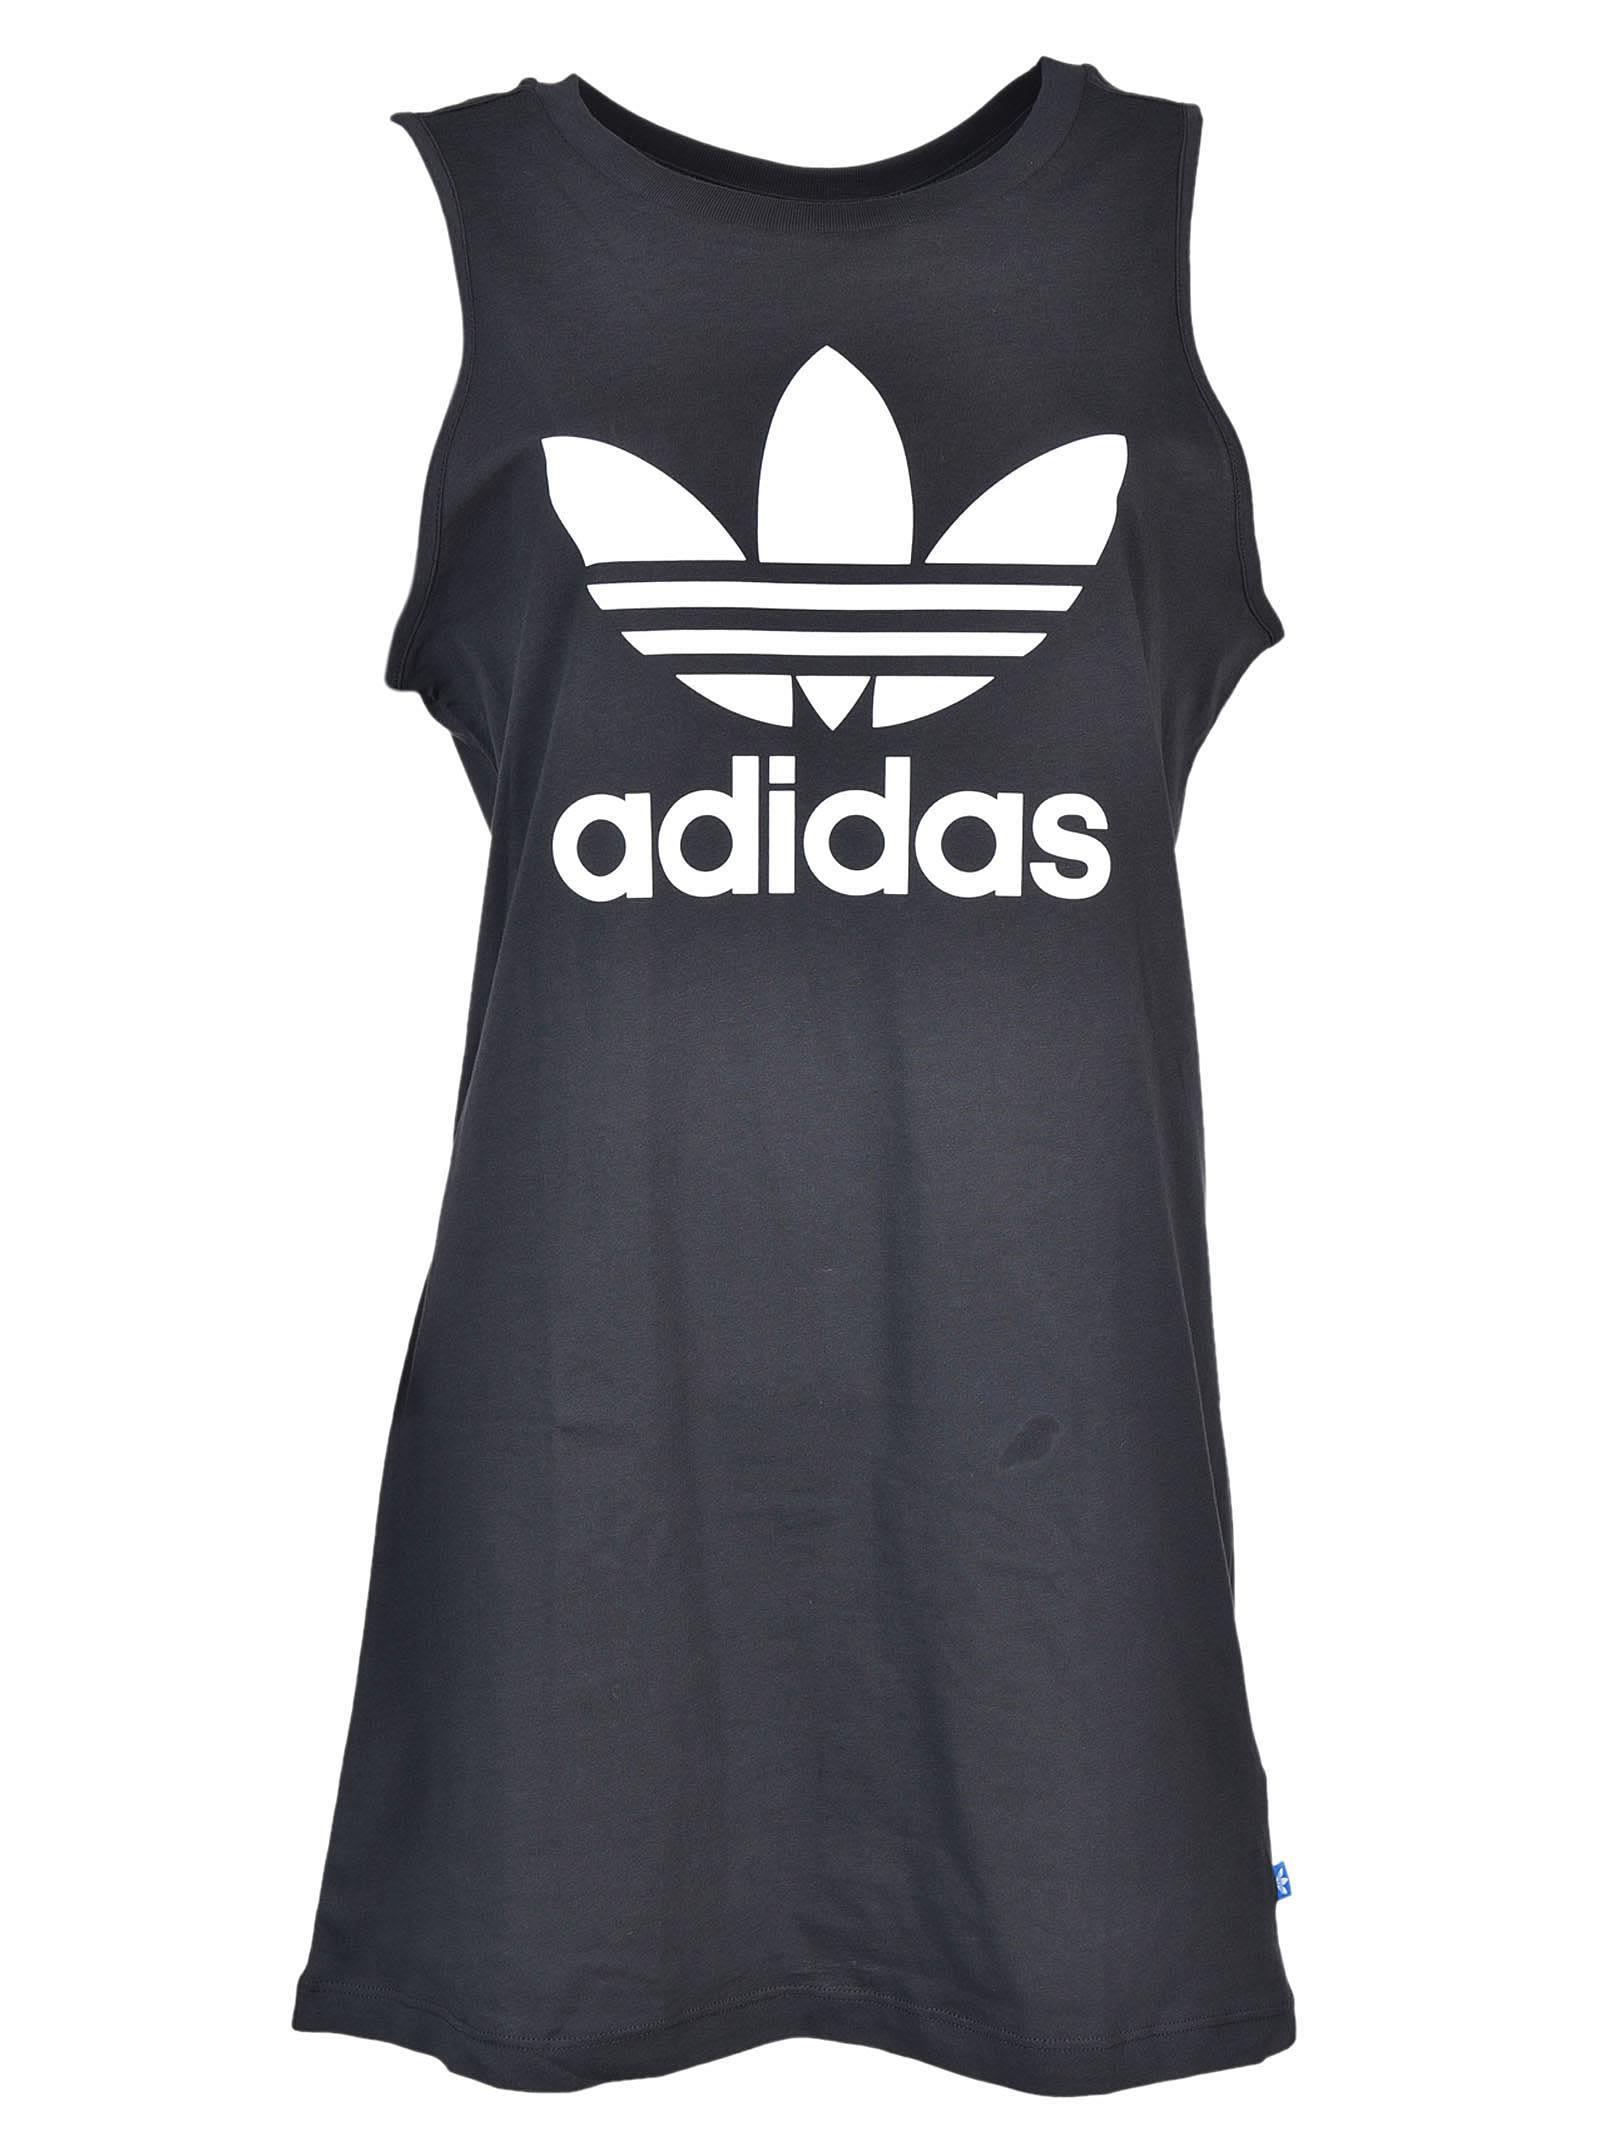 Adidas Trefoil Tank Dress